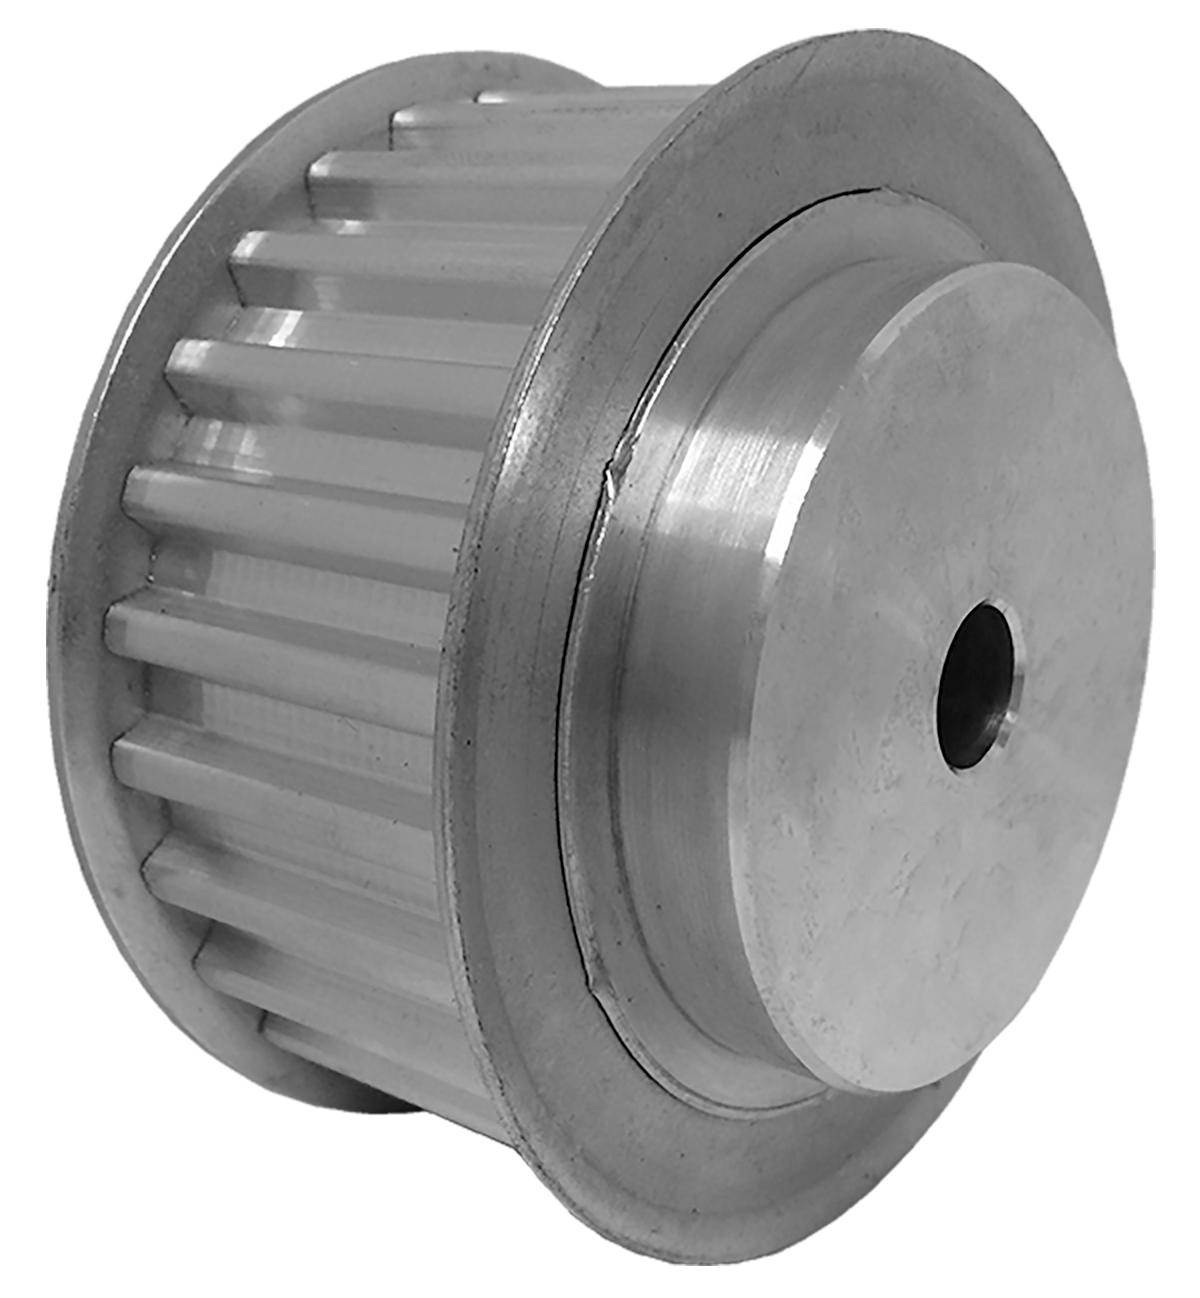 47T10/27-2 - Aluminum Metric Pulleys